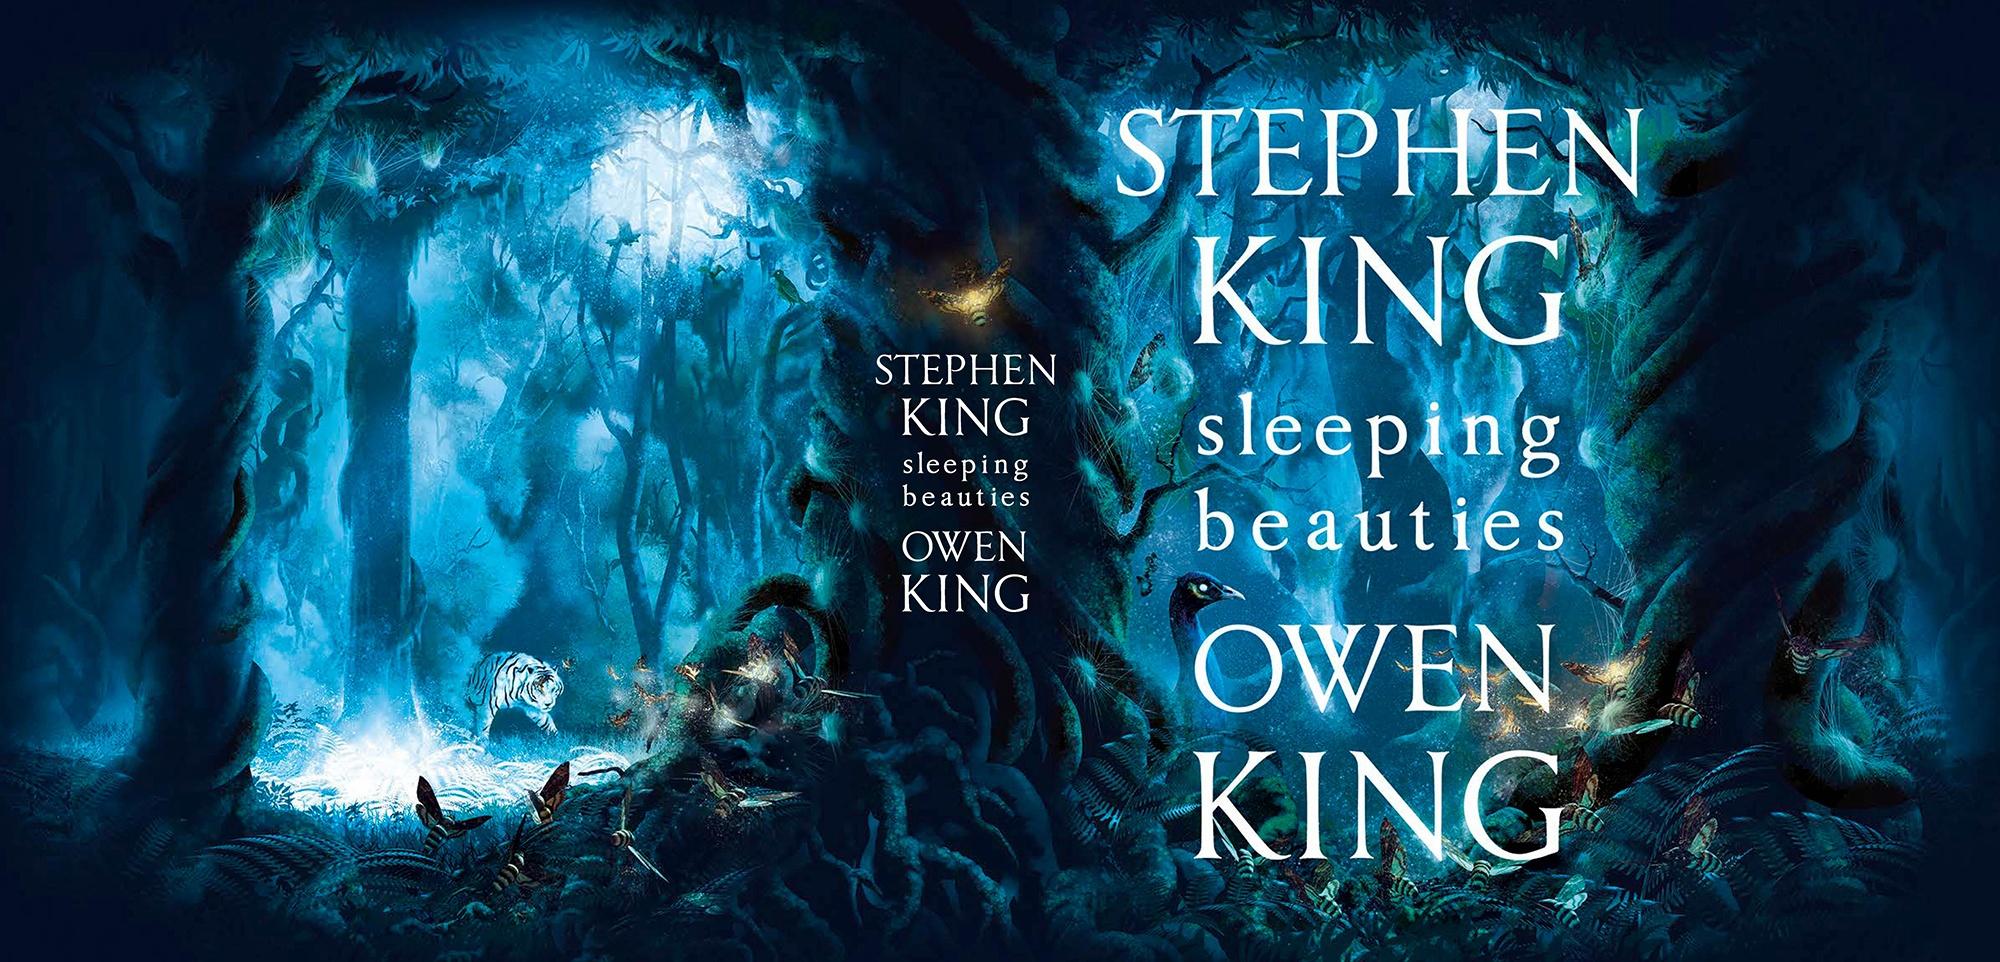 Обложка к английскому изданию романа Стивена и Оуэна Кинга Sleeping Beauties